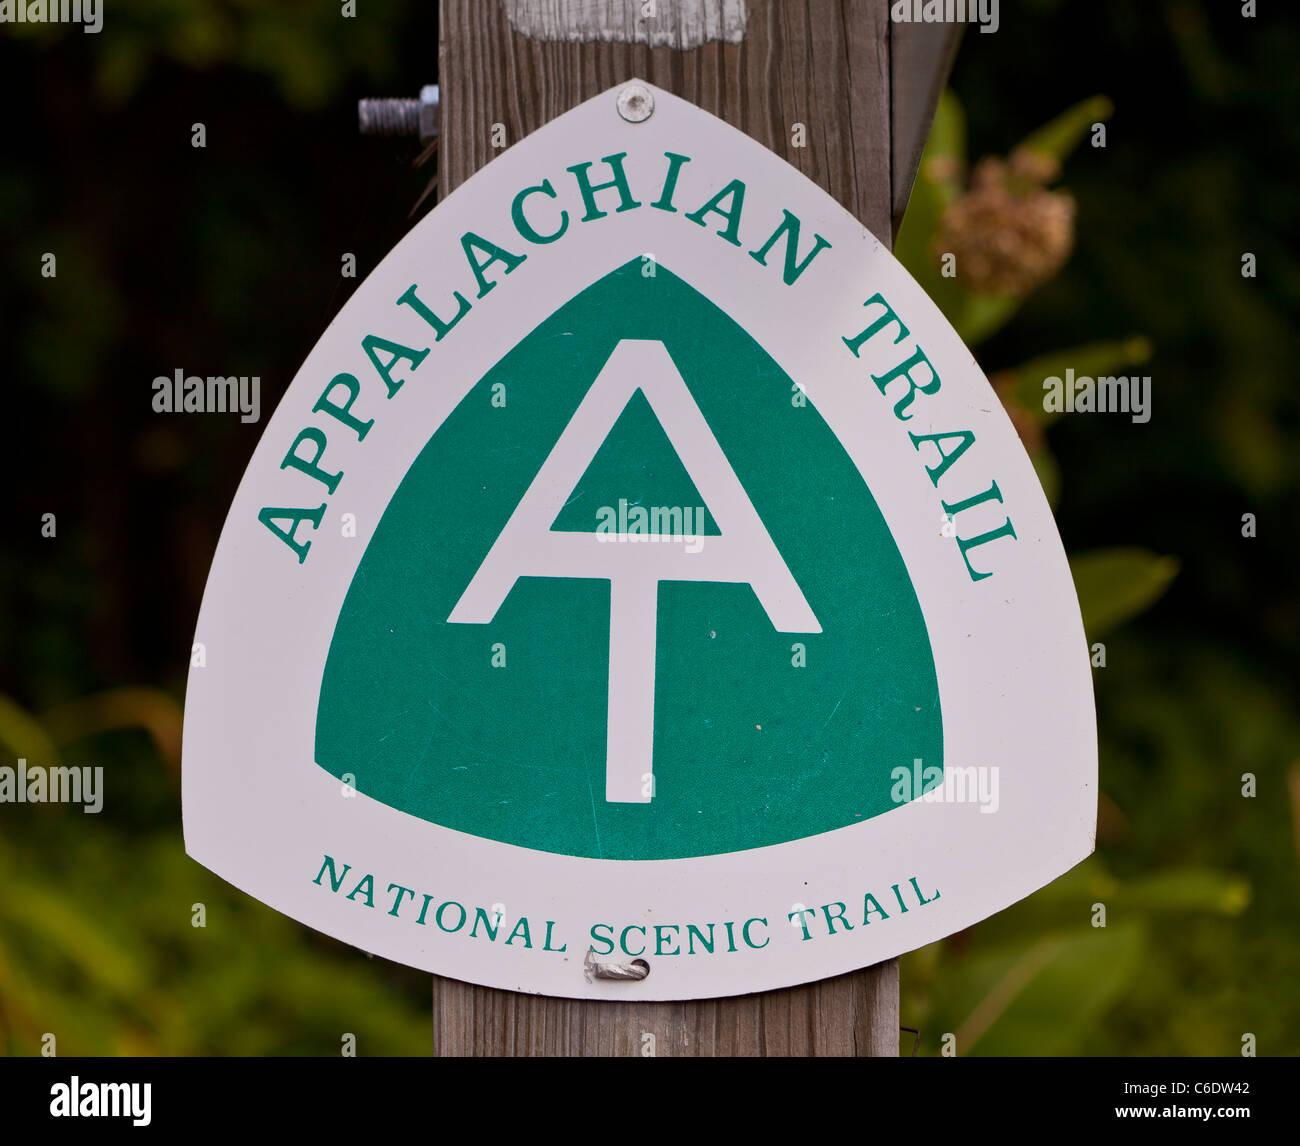 APPALACHIAN TRAIL, VIRGINIA, USA - AT sign on trail to McAfee Knob on Catawba Mountain, near city of Roanoke. - Stock Image